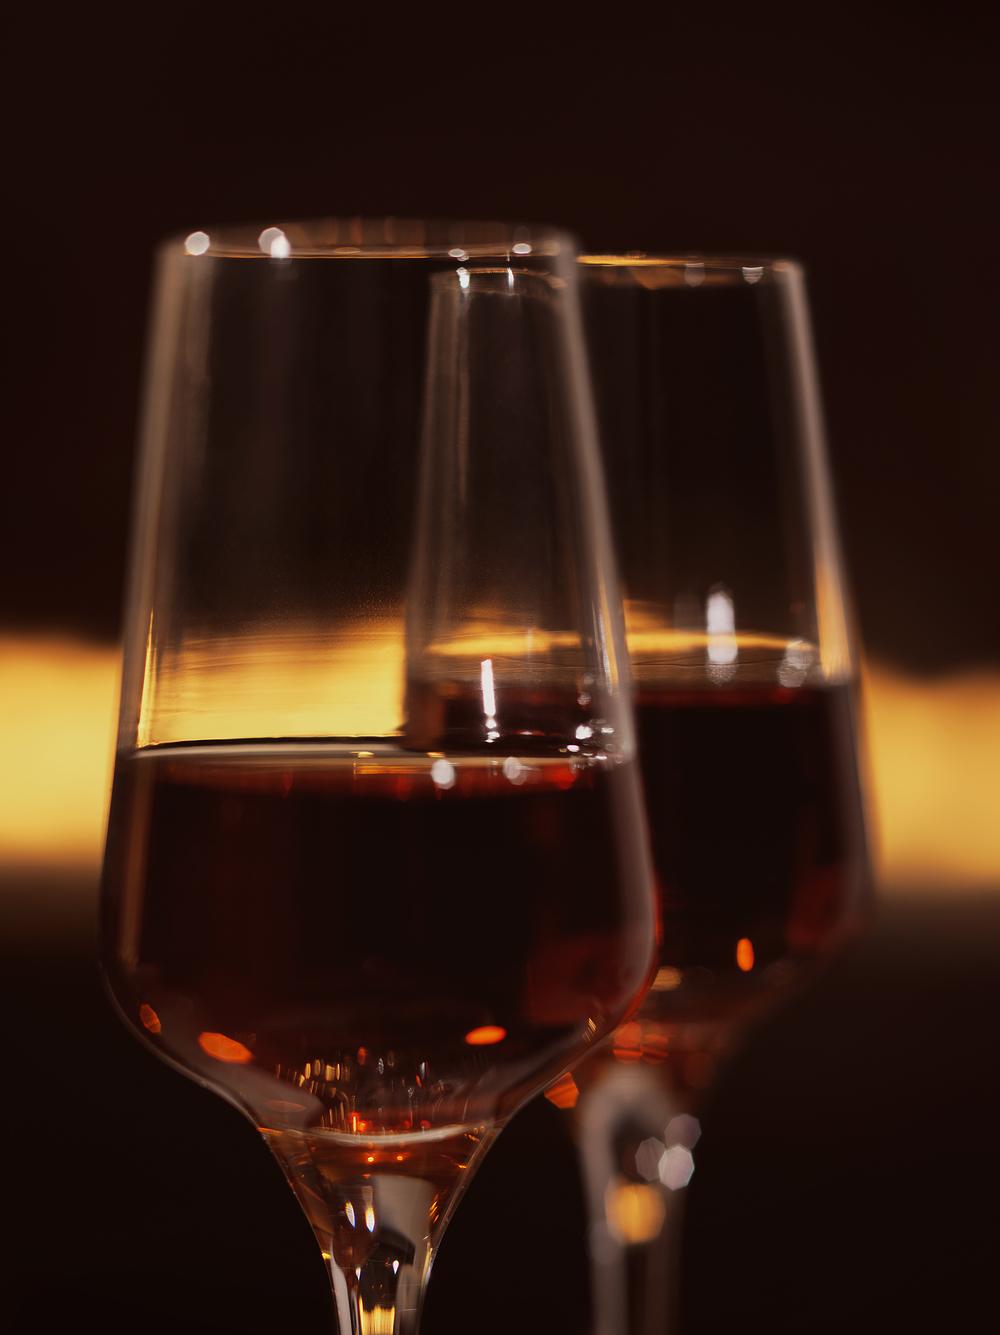 ice wine ontario photographer fuze jim norton